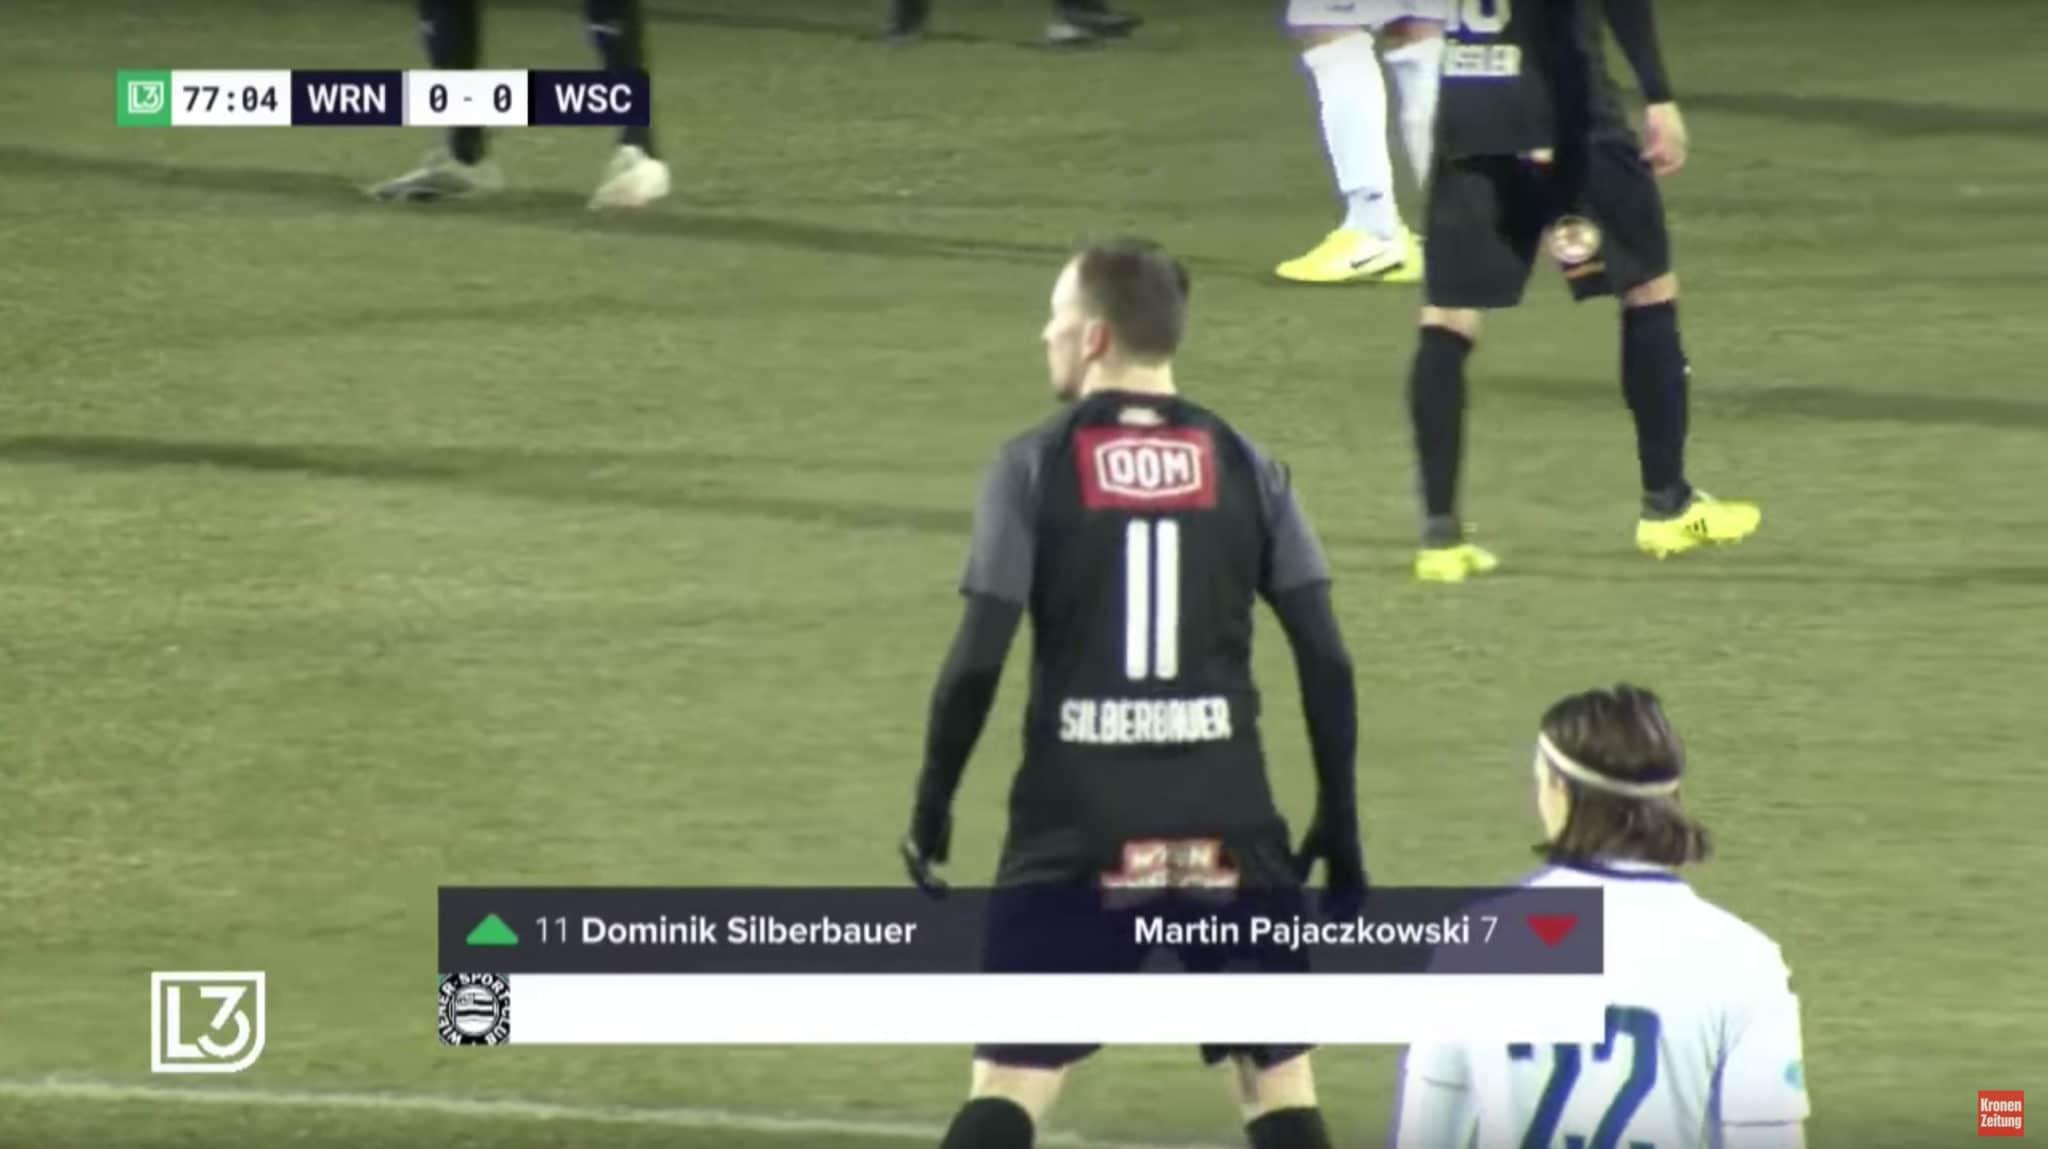 Regionalliga Ost On Air Graphics / Medienproduktion